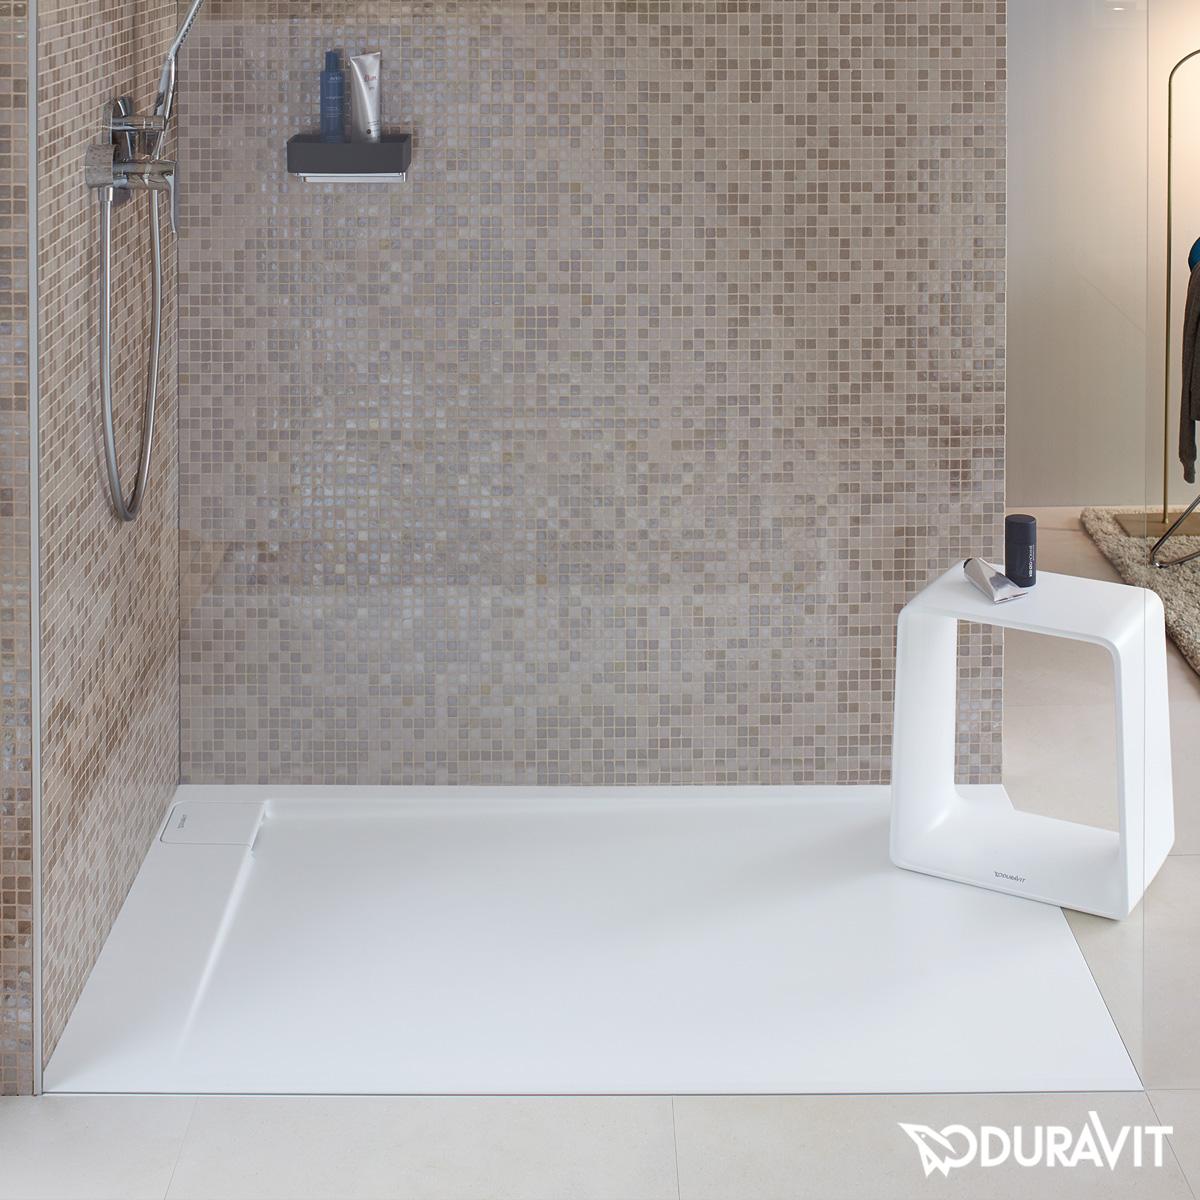 duravit p3 comforts rechteck duschwanne ecke links 720159000000000 reuter onlineshop. Black Bedroom Furniture Sets. Home Design Ideas